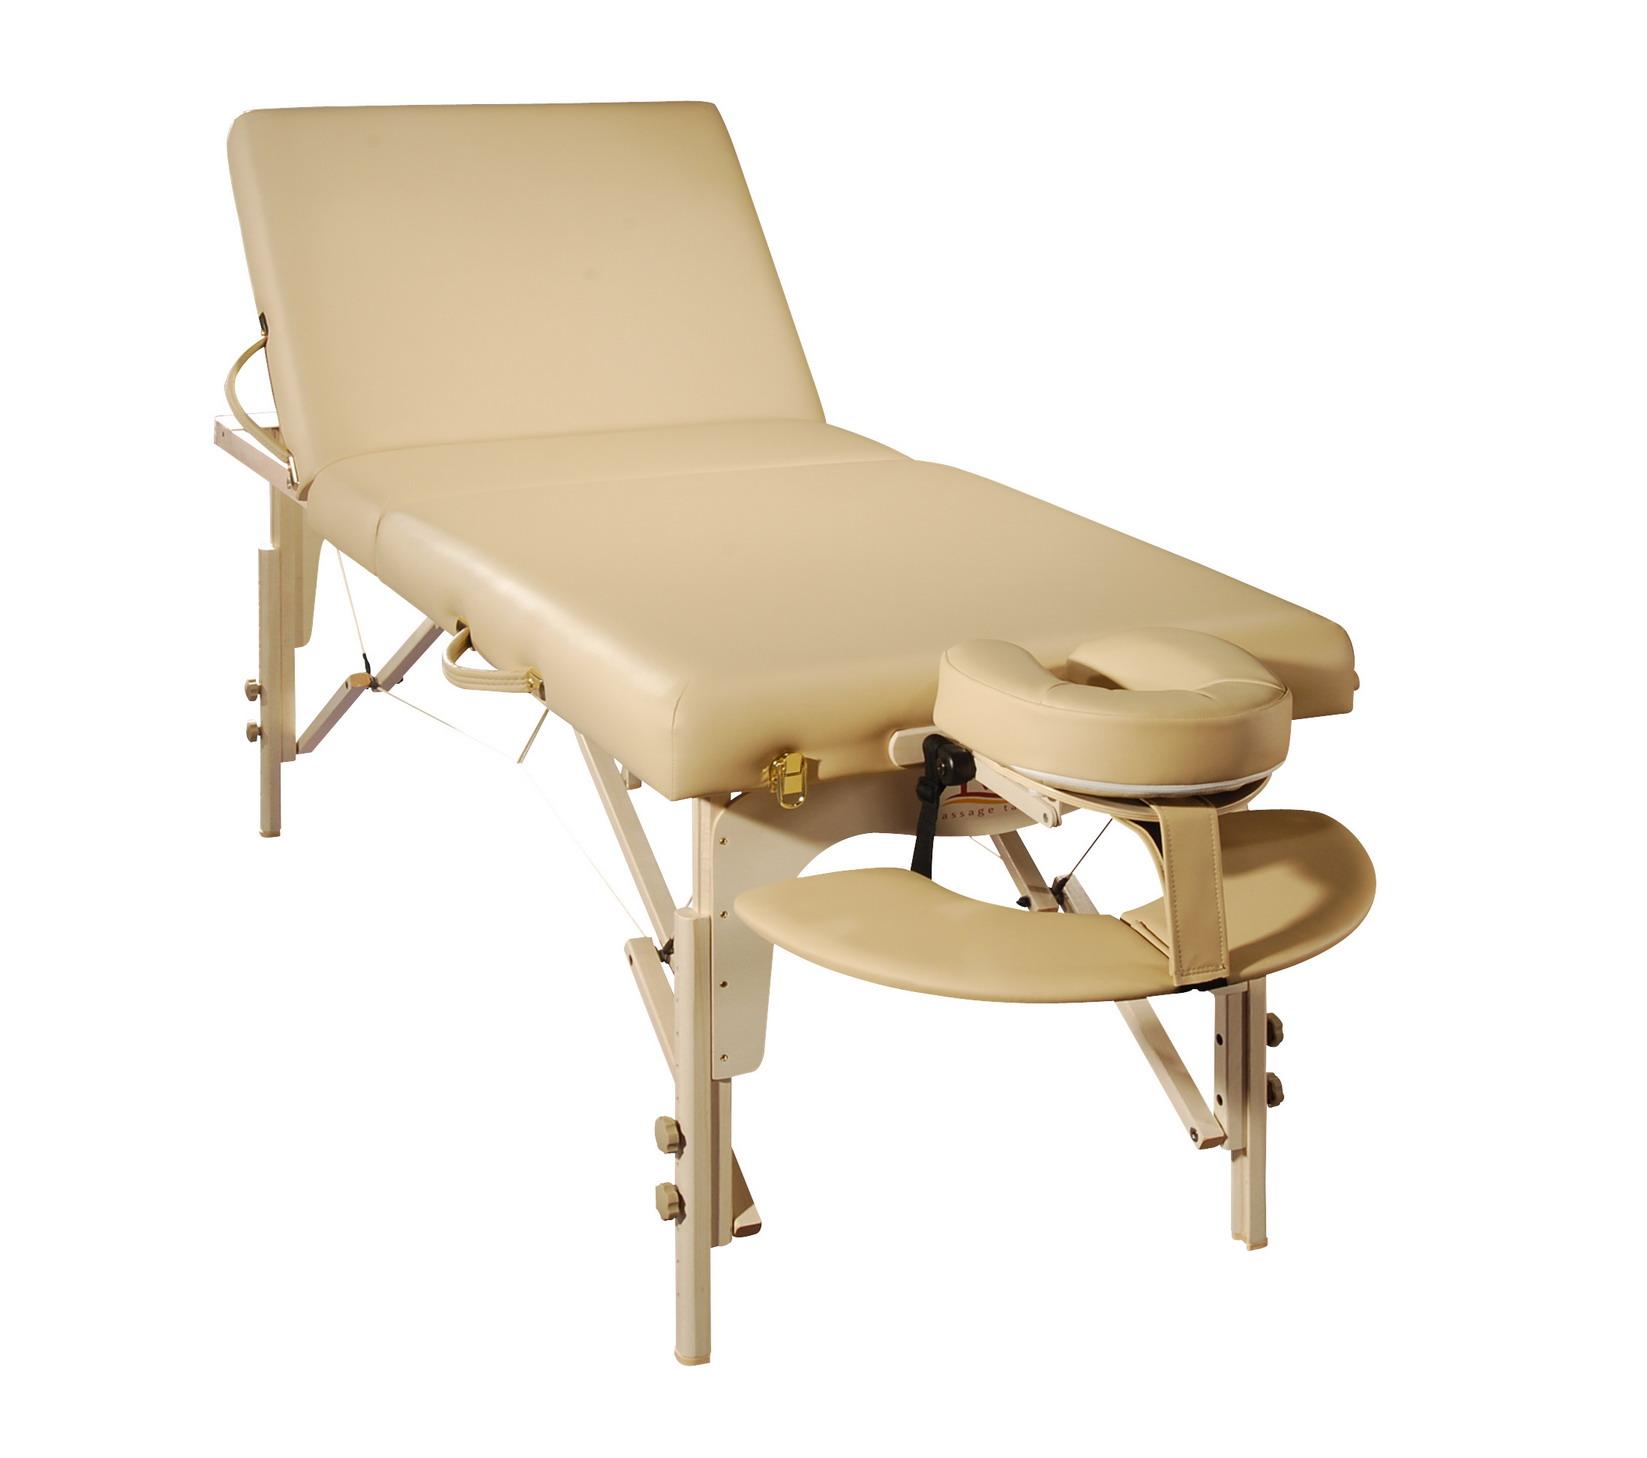 salon chairs in delhi desk chair on wood floor far infrared sauna room